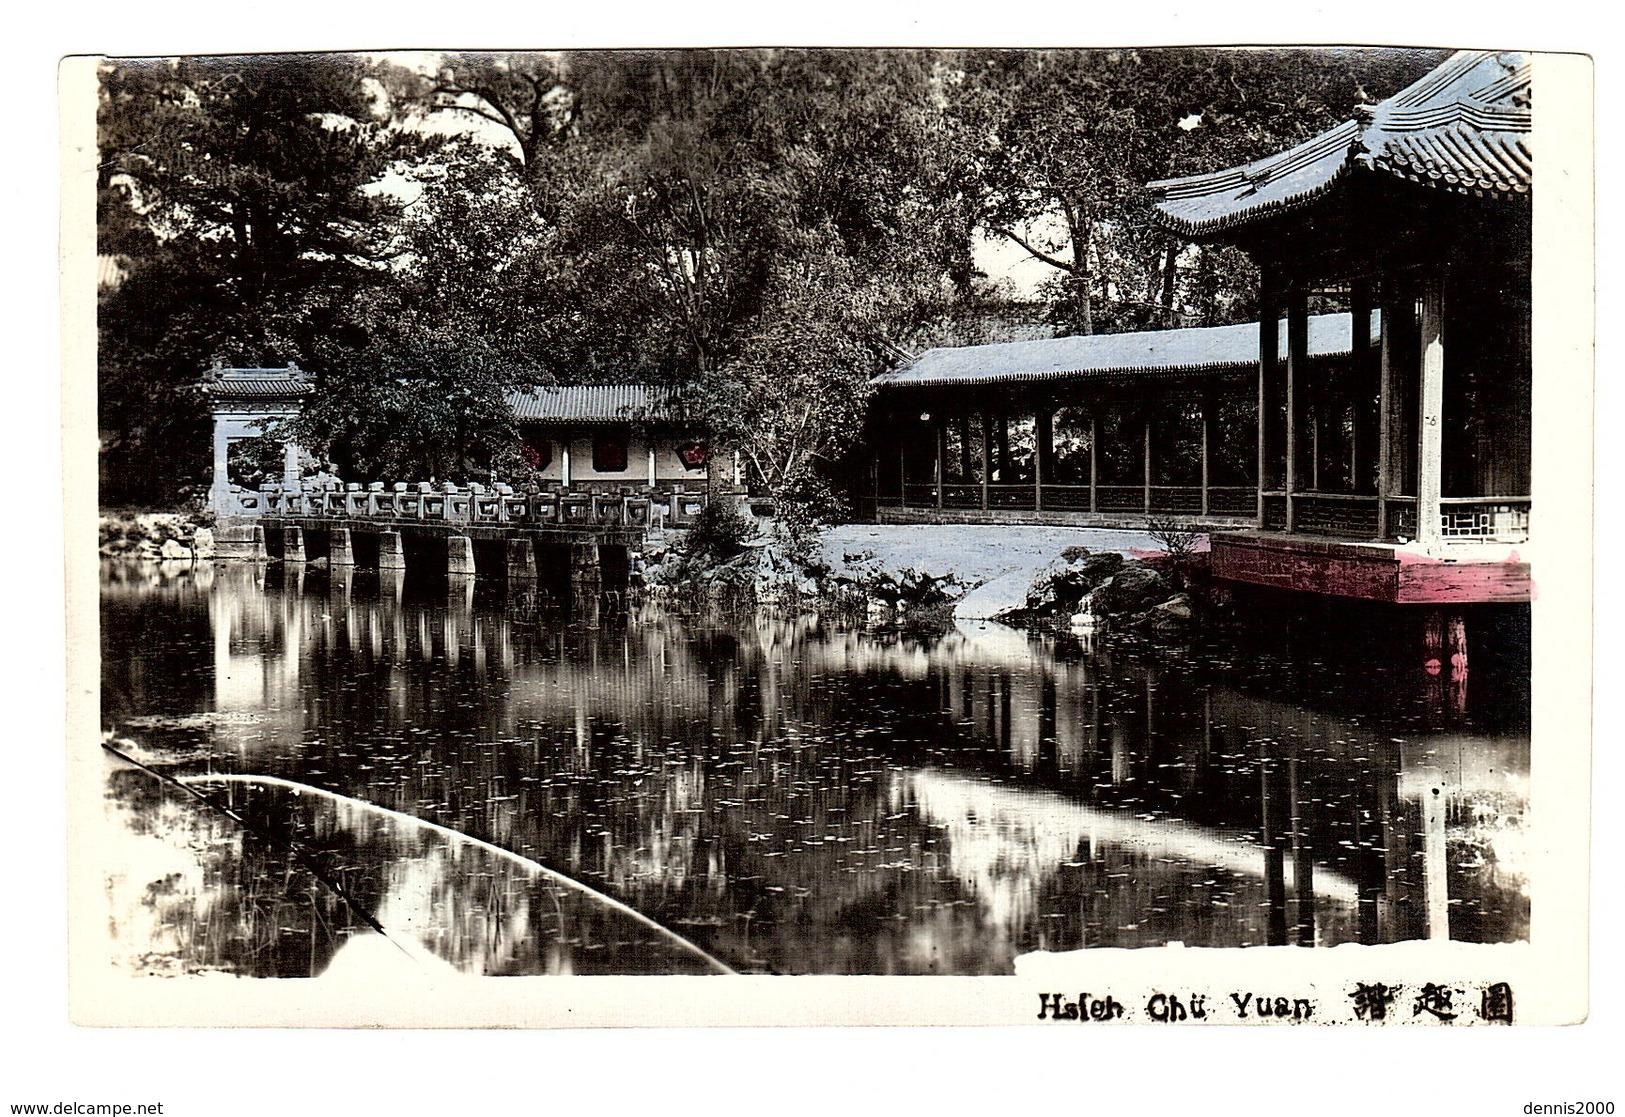 CHINE - PHOTO - Hsieh Chü Yuan - Chine